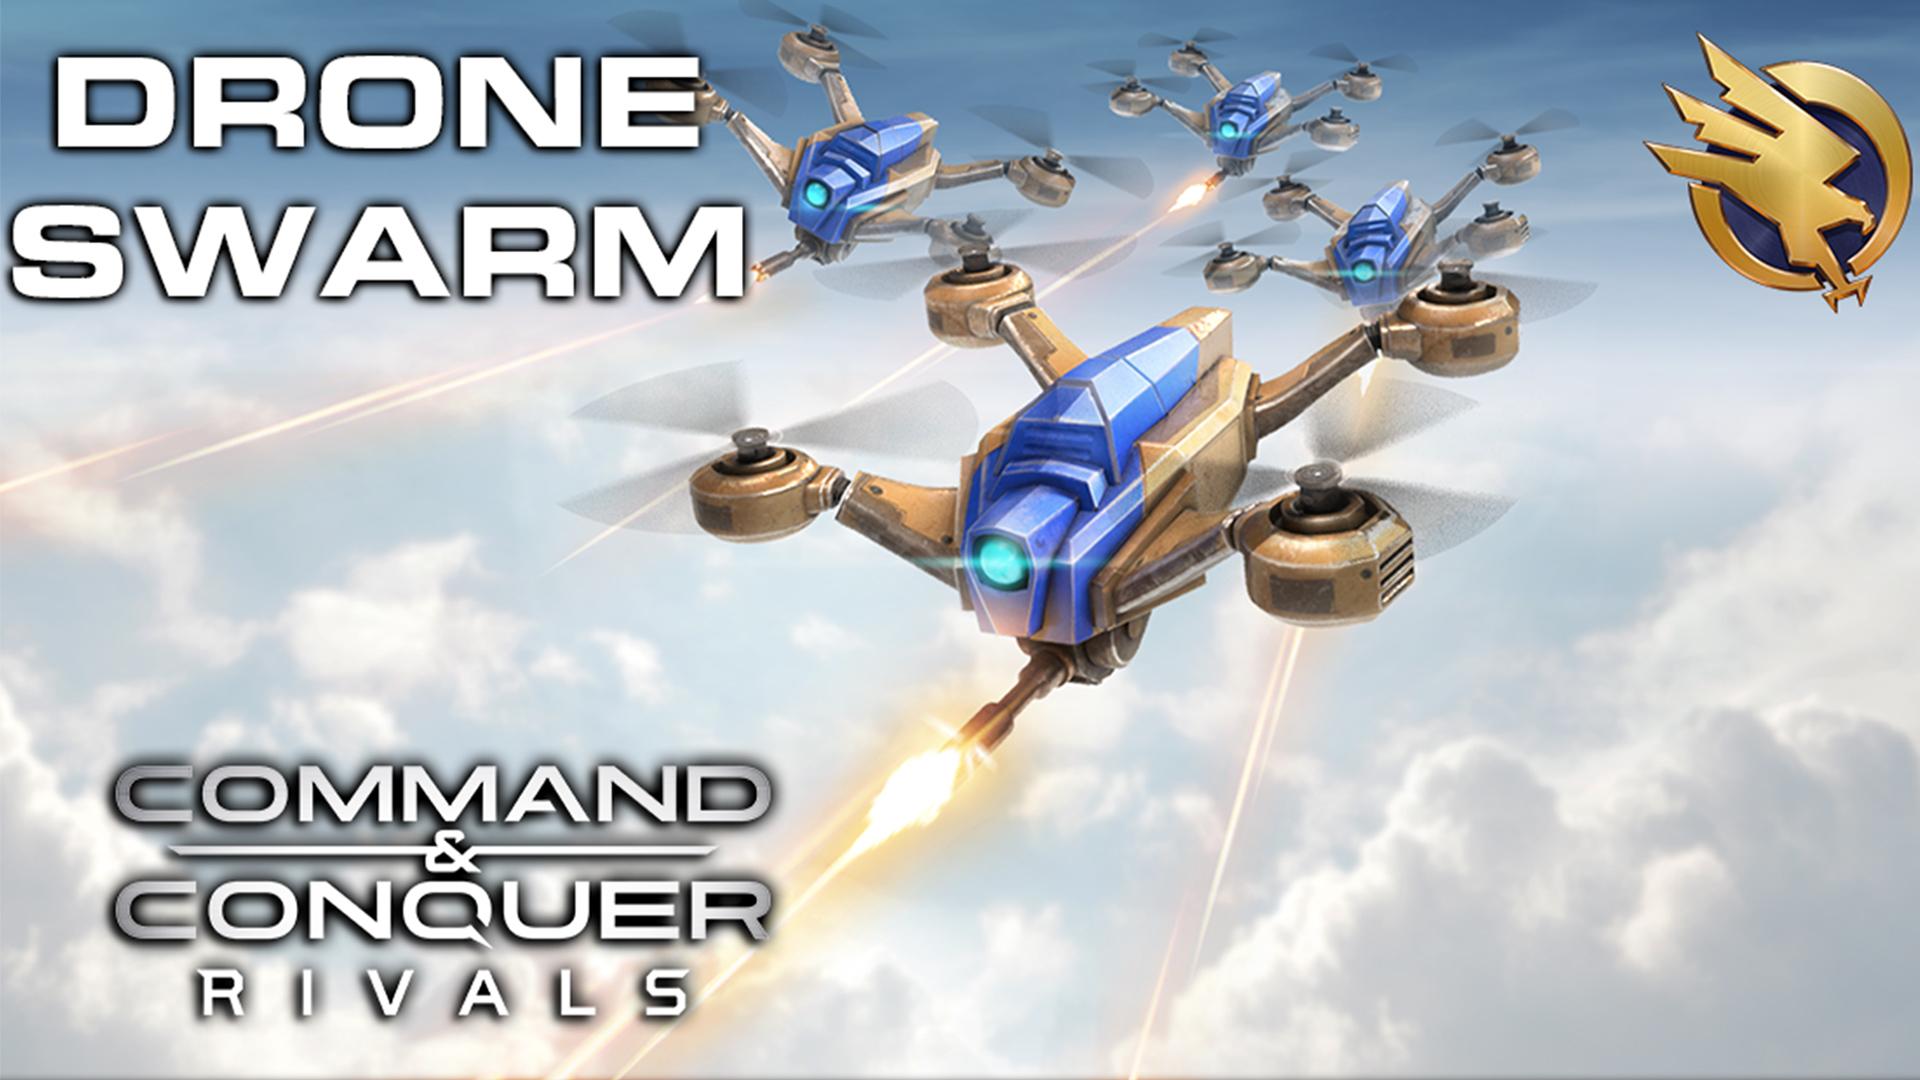 ea-blog-image-cc-rivals-drone-swarm-reve